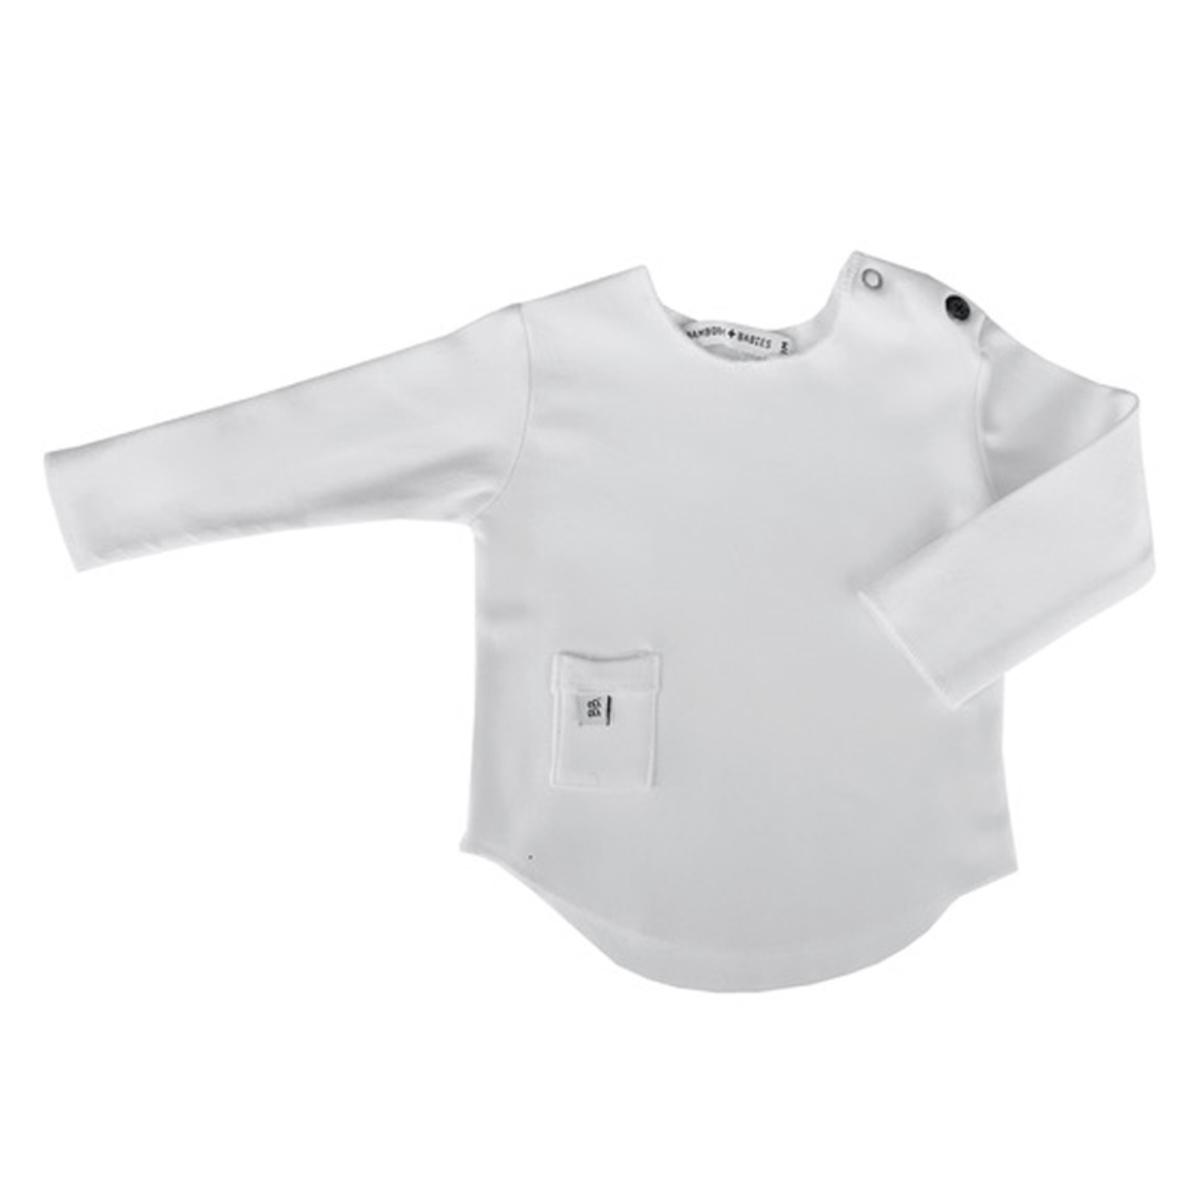 Haut bébé Tee-Shirt Manches Longues Blanc - 6 Mois Tee-Shirt Manches Longues Blanc - 6 Mois